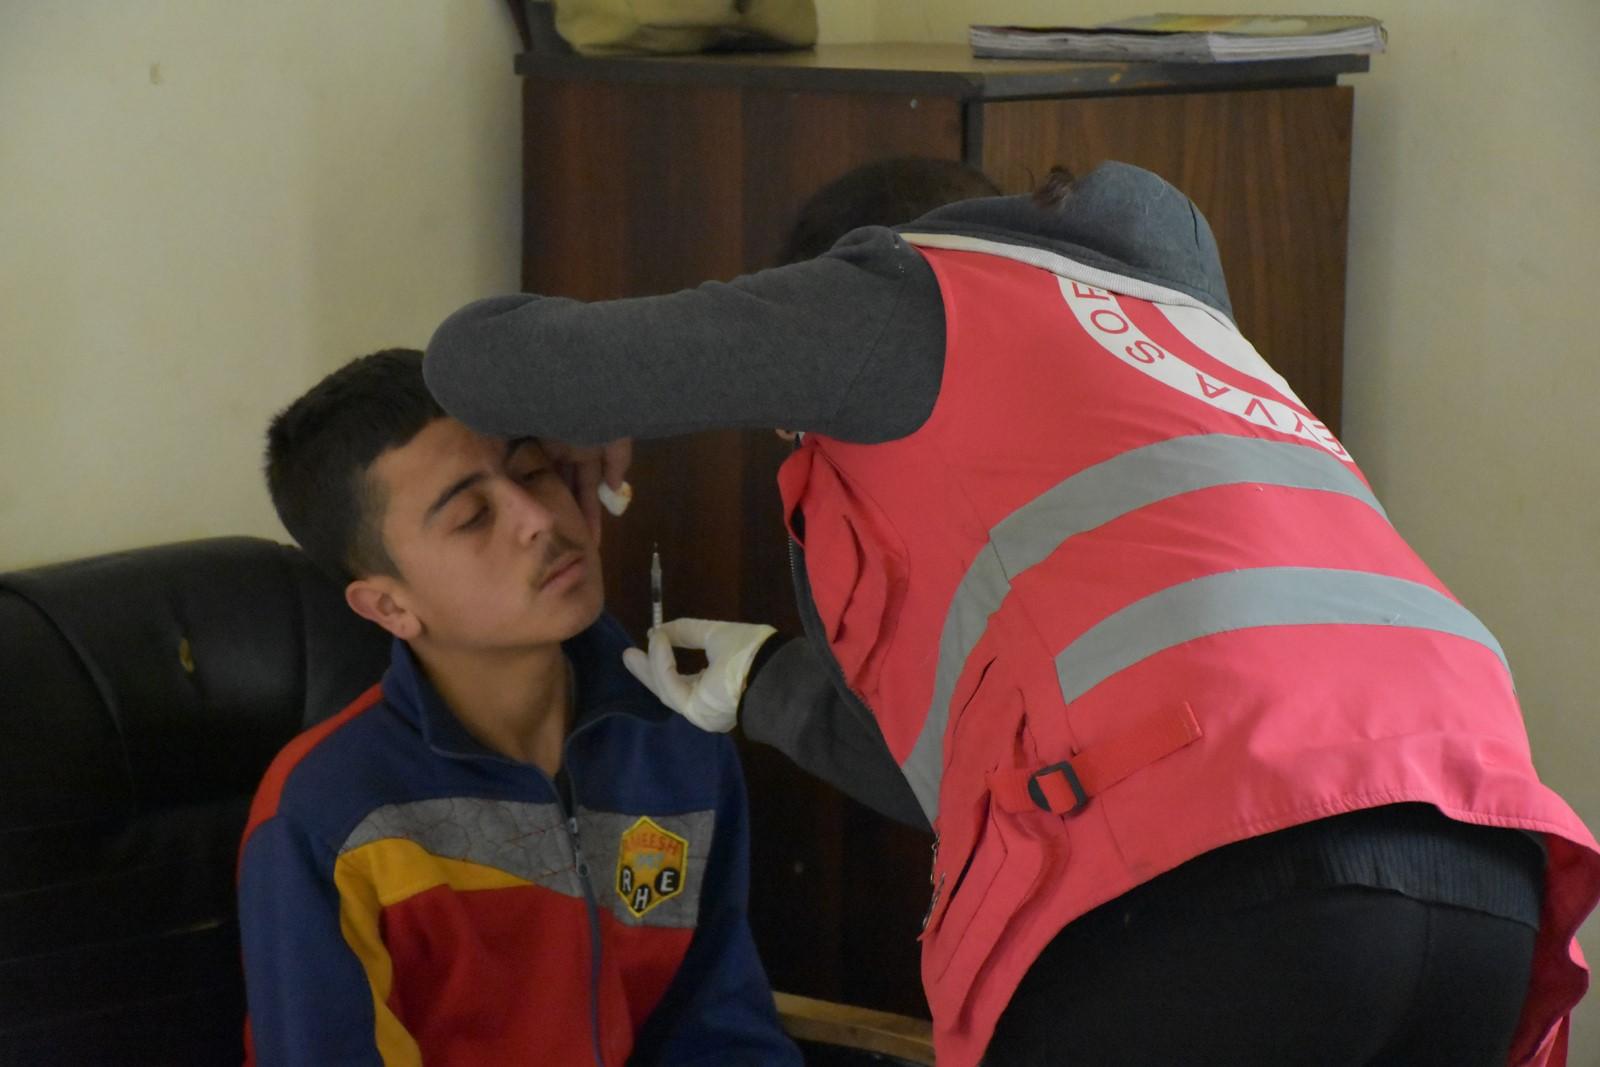 Despite poor capabilities, Kurdish Red Crescent provides treatment